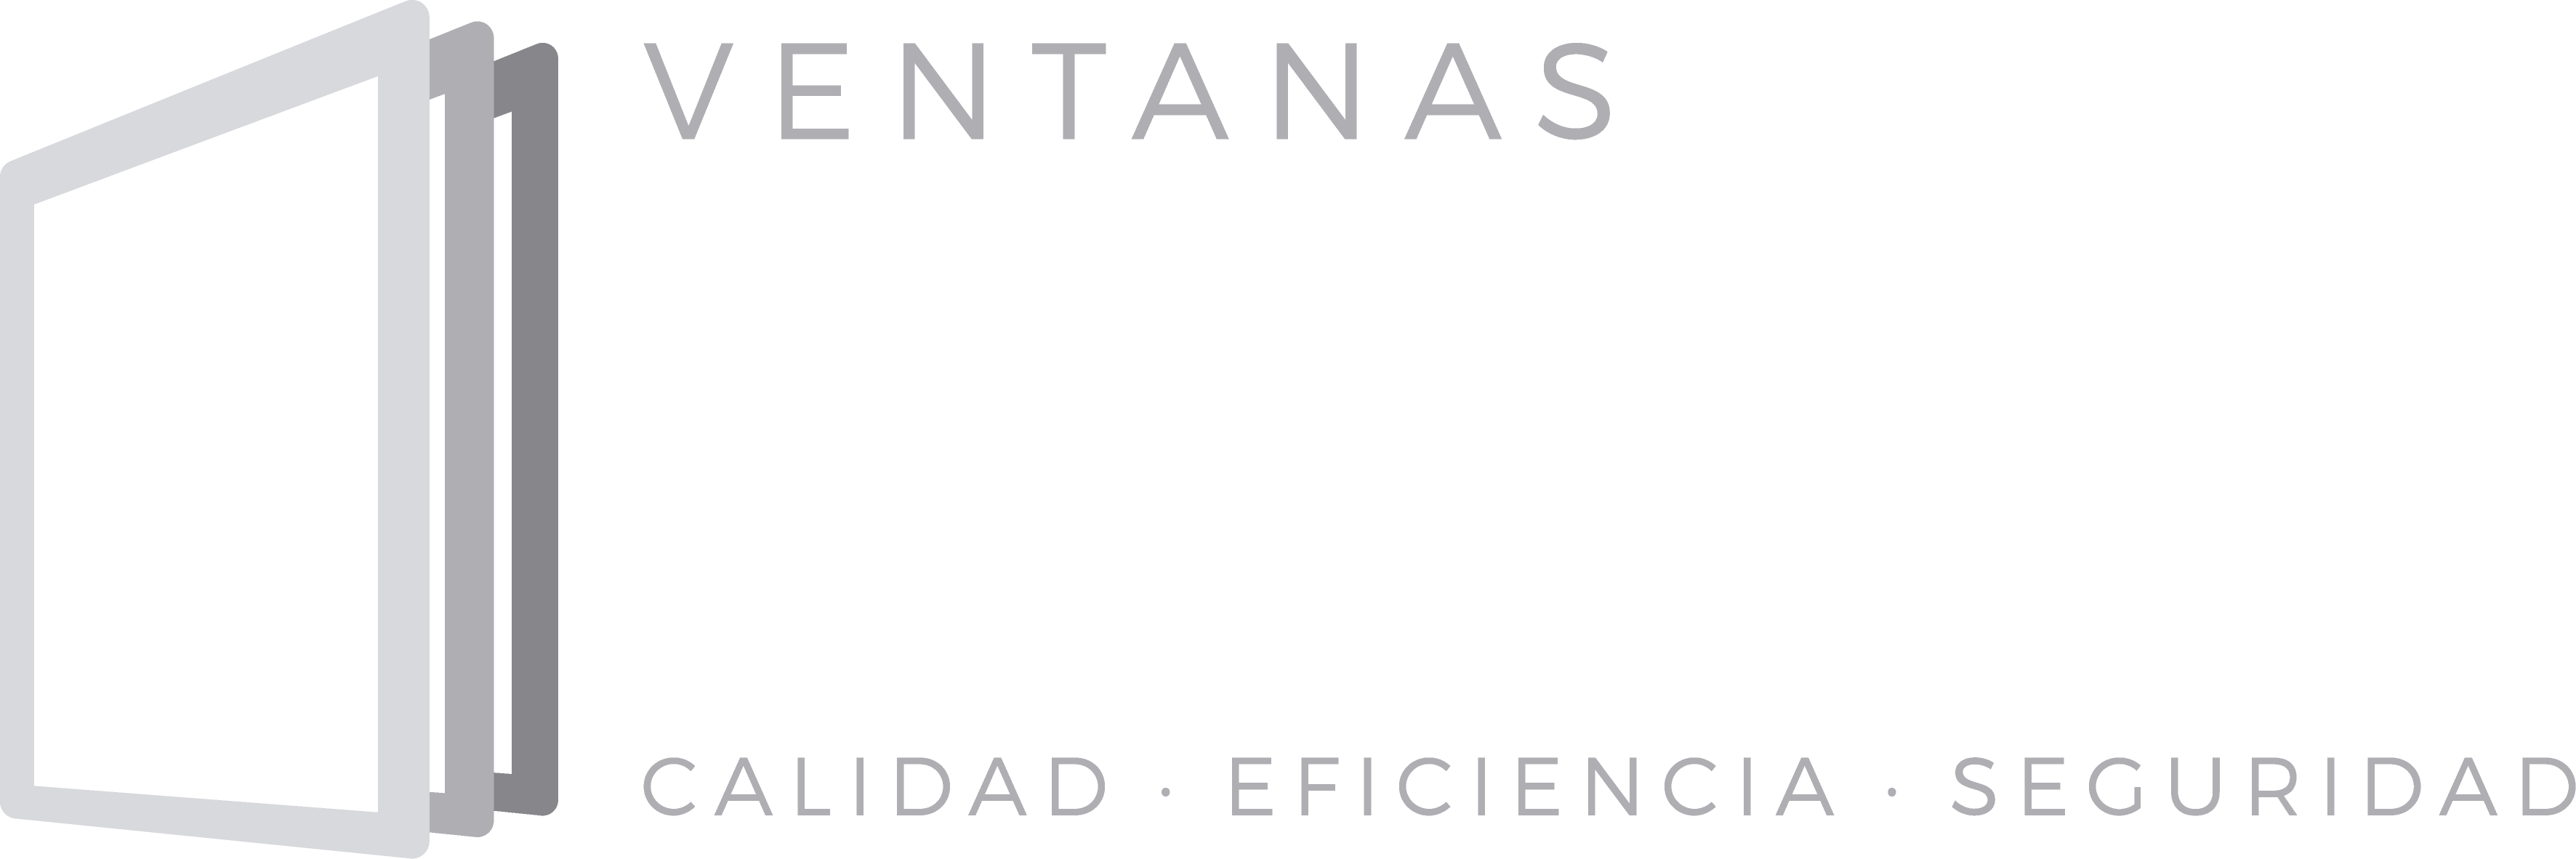 Ventanas Costa Chamartín